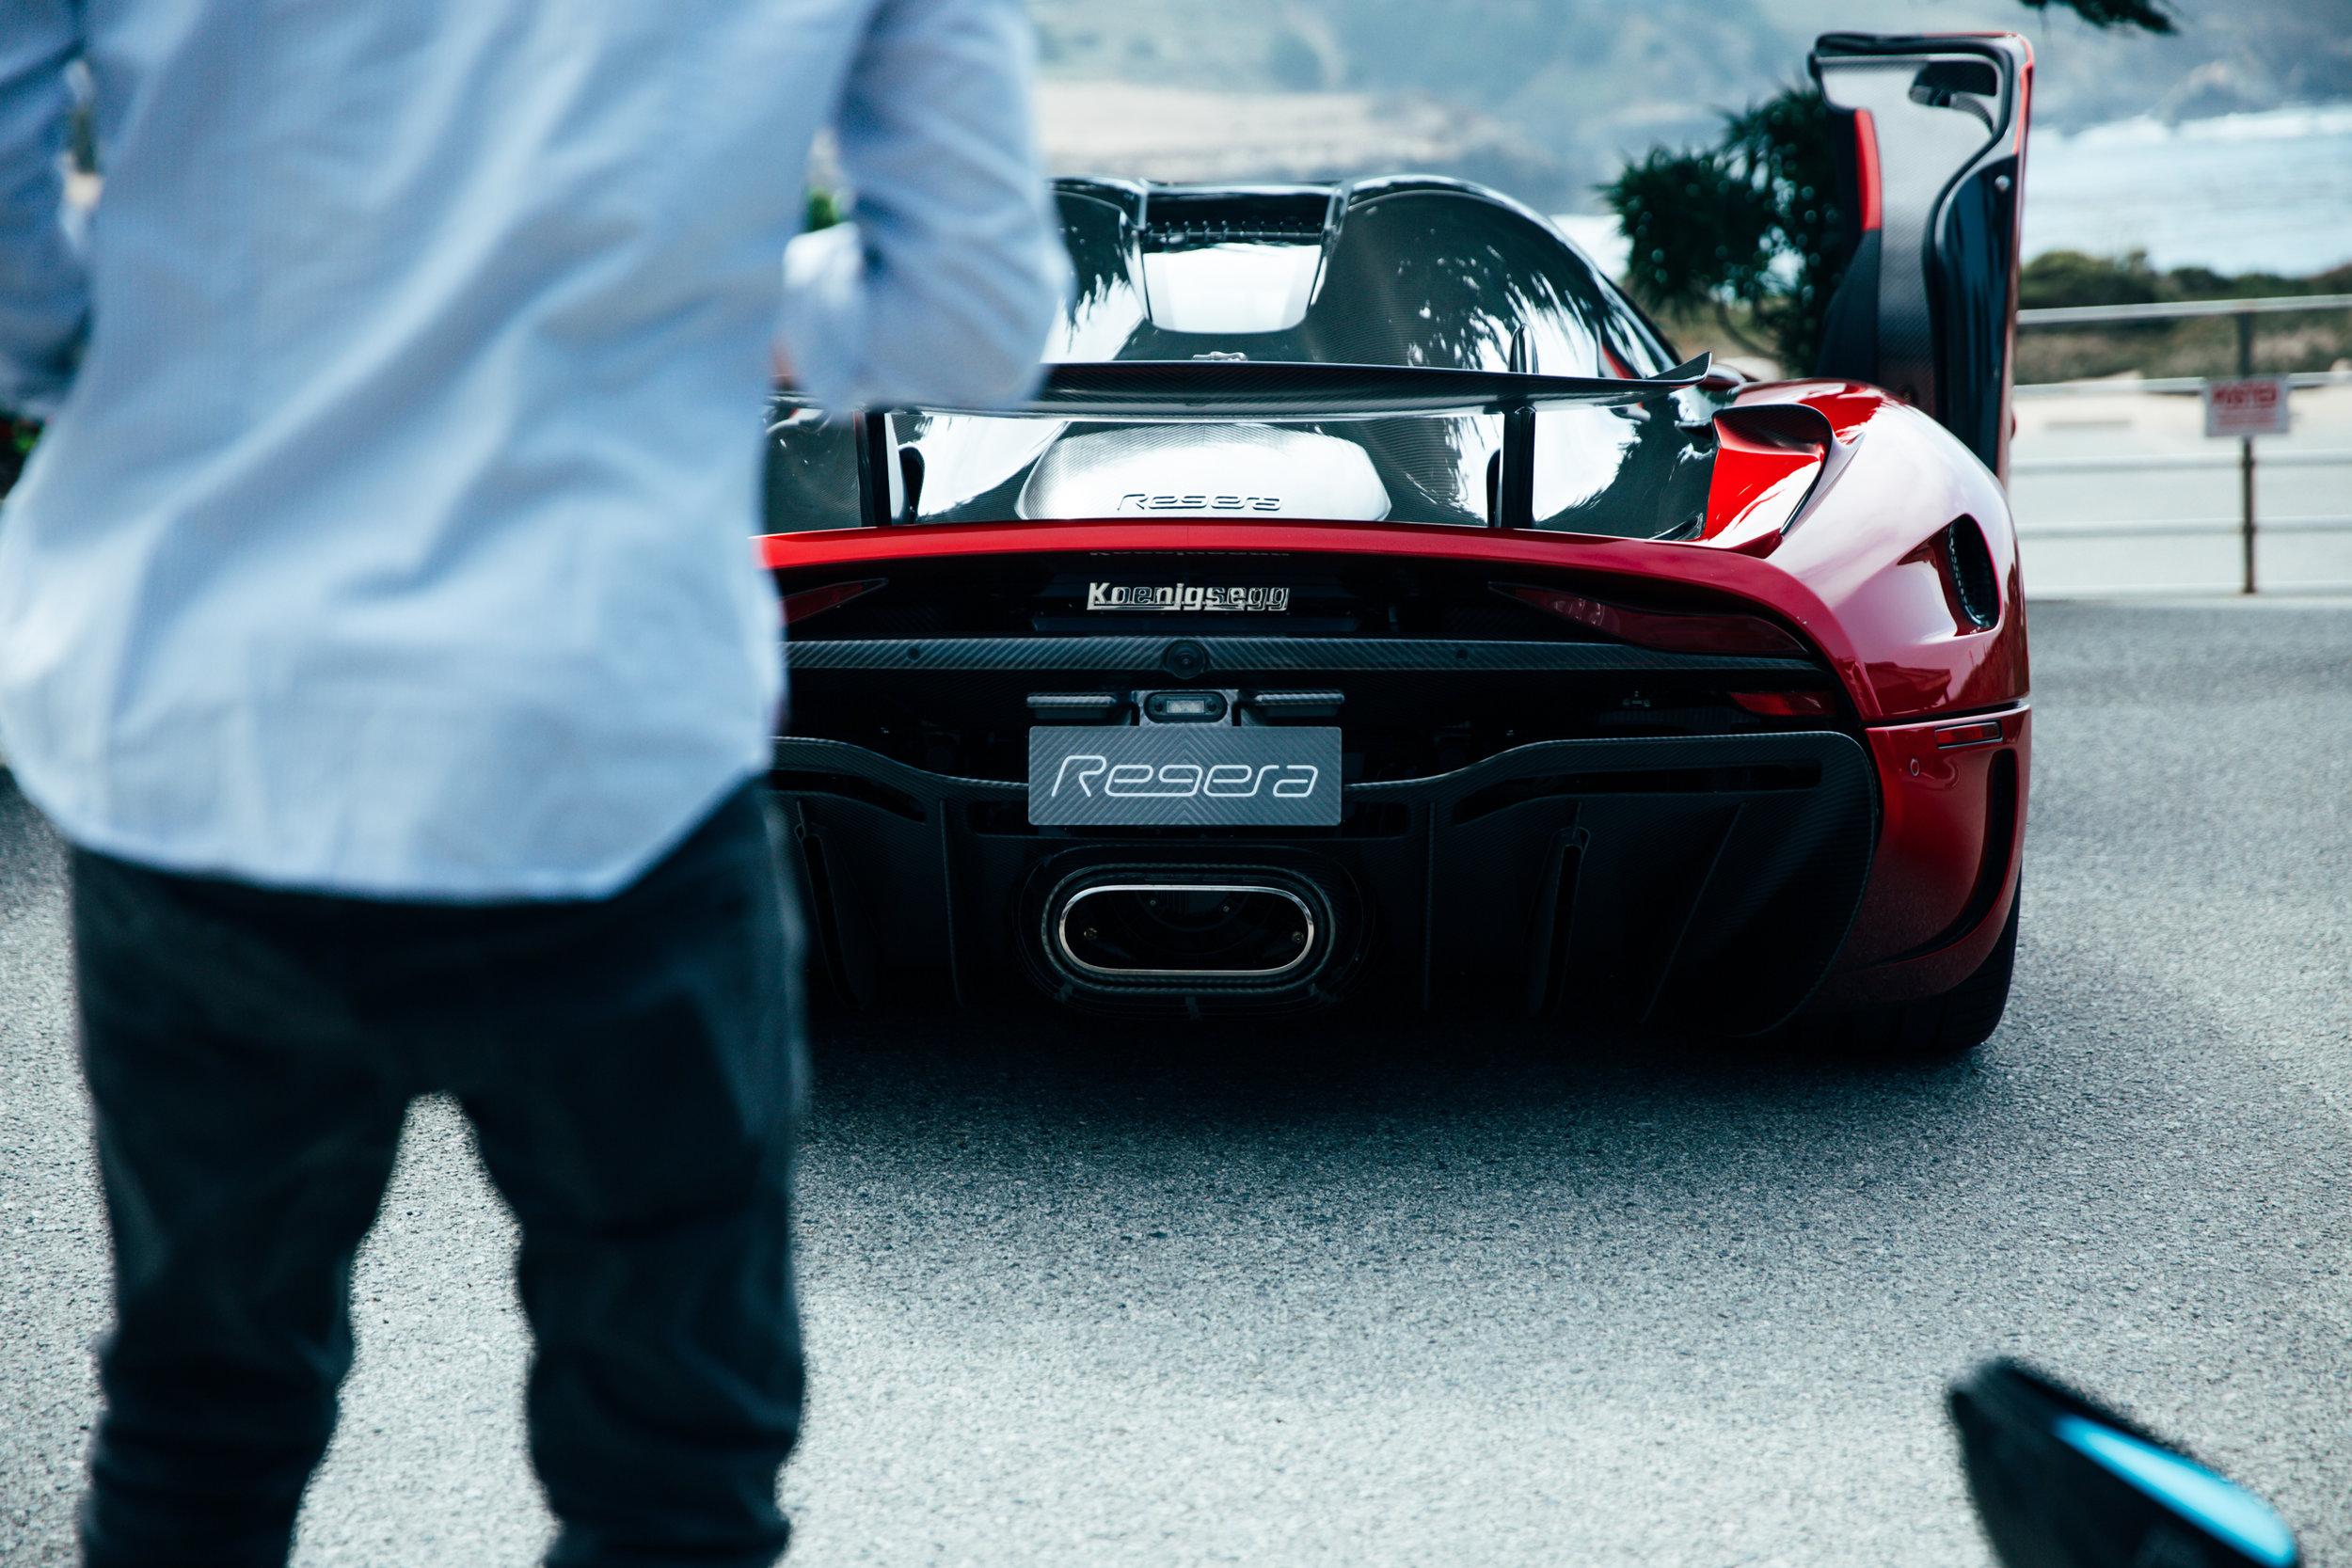 Stay_Driven_Monterey_Car_Week_Koenigsegg-36.jpg